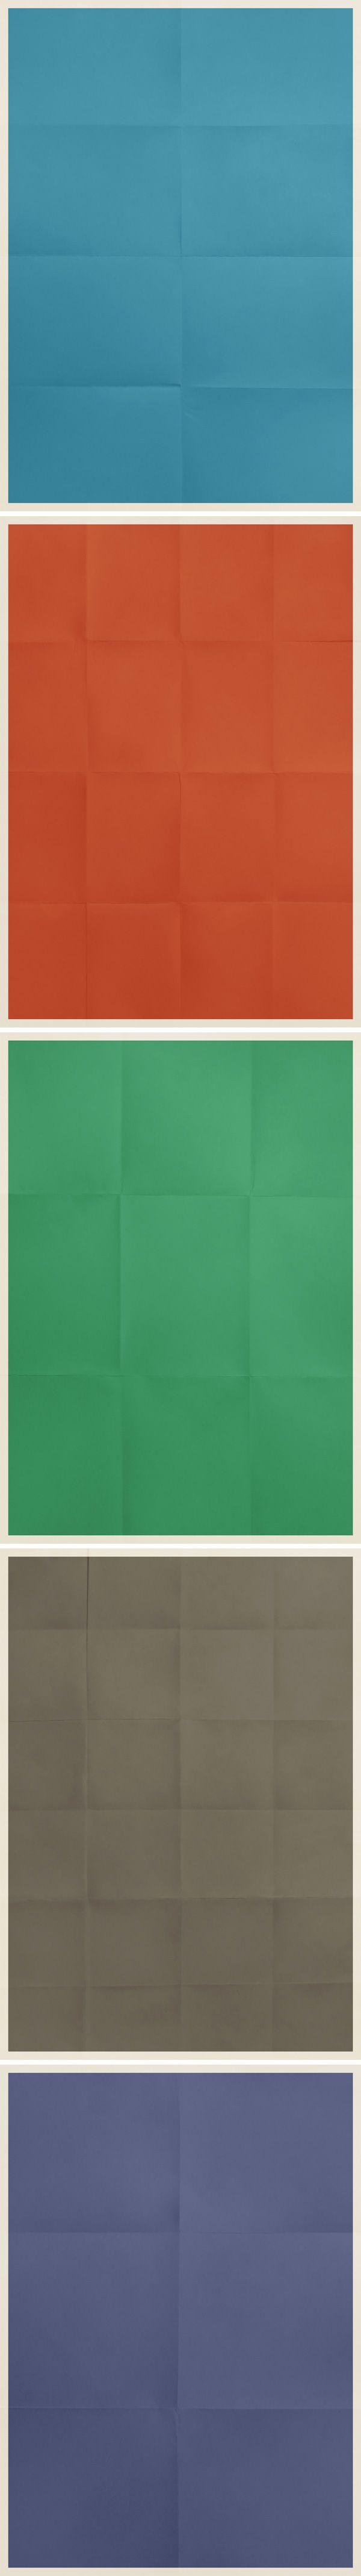 5 Adet Katlanmış Kağıt Arkaplanı (PSD,JPG) http://www.gafolik.com/5-adet-katlanmis-kagit-arkaplani-psdjpg/